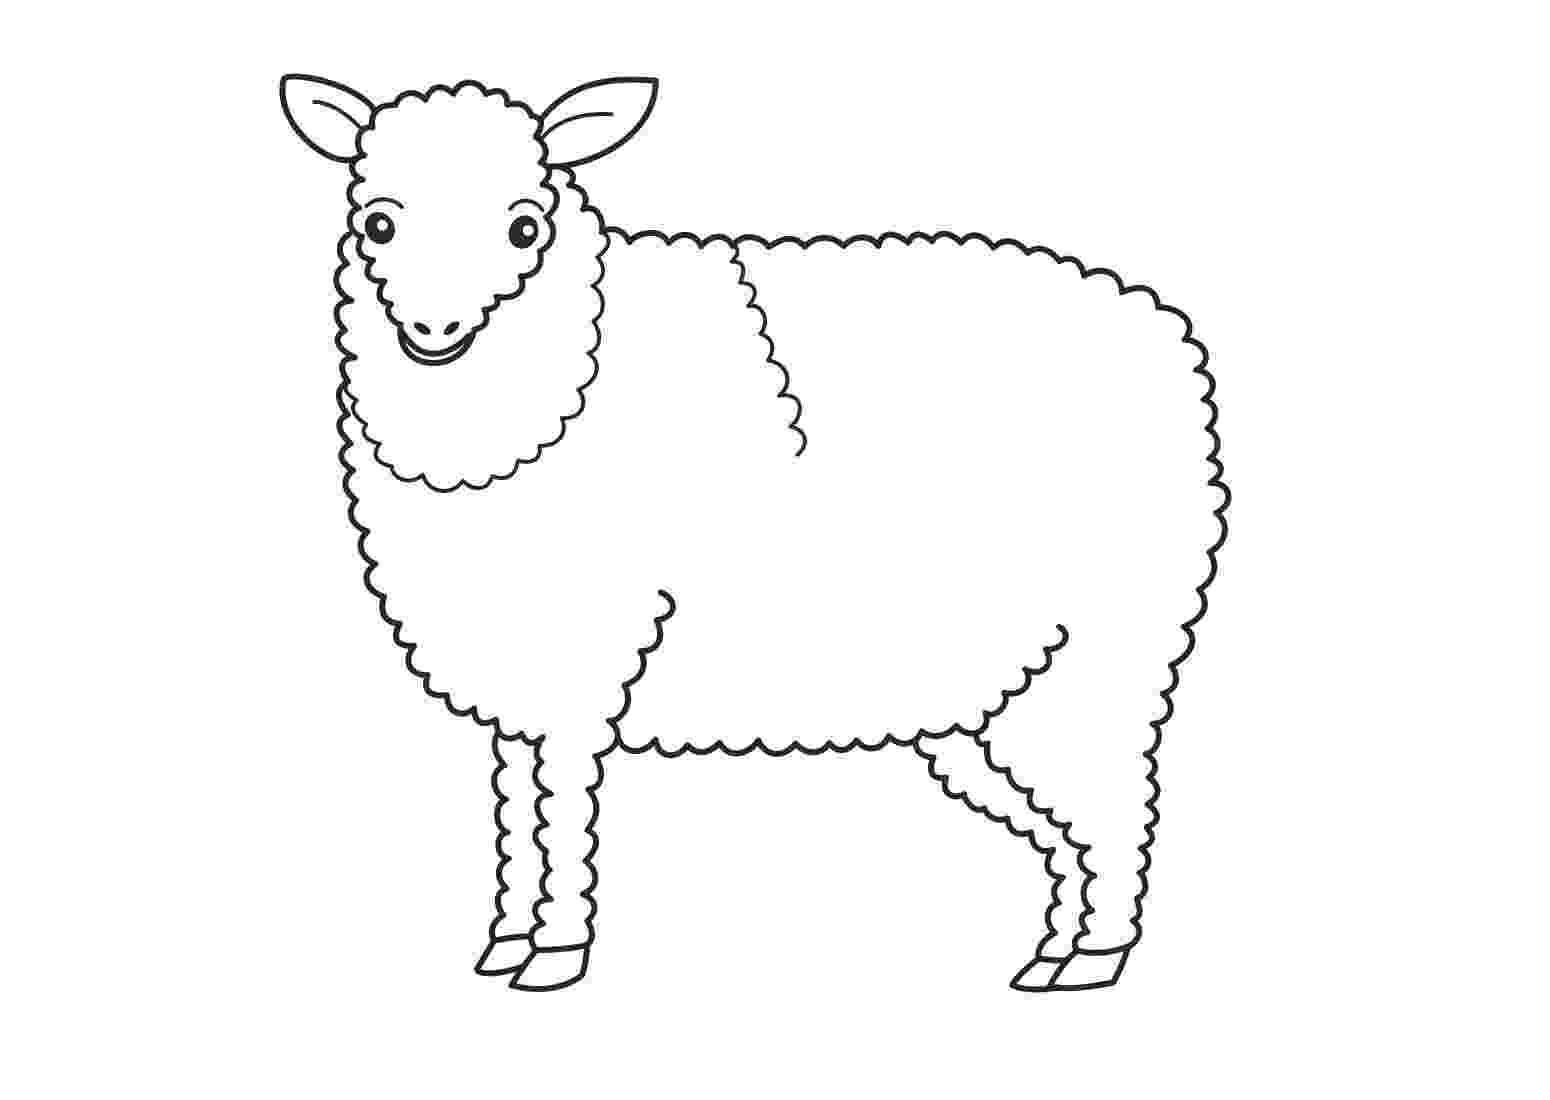 sheep coloring sheet free printable sheep coloring pages for kids coloring sheet sheep 1 1